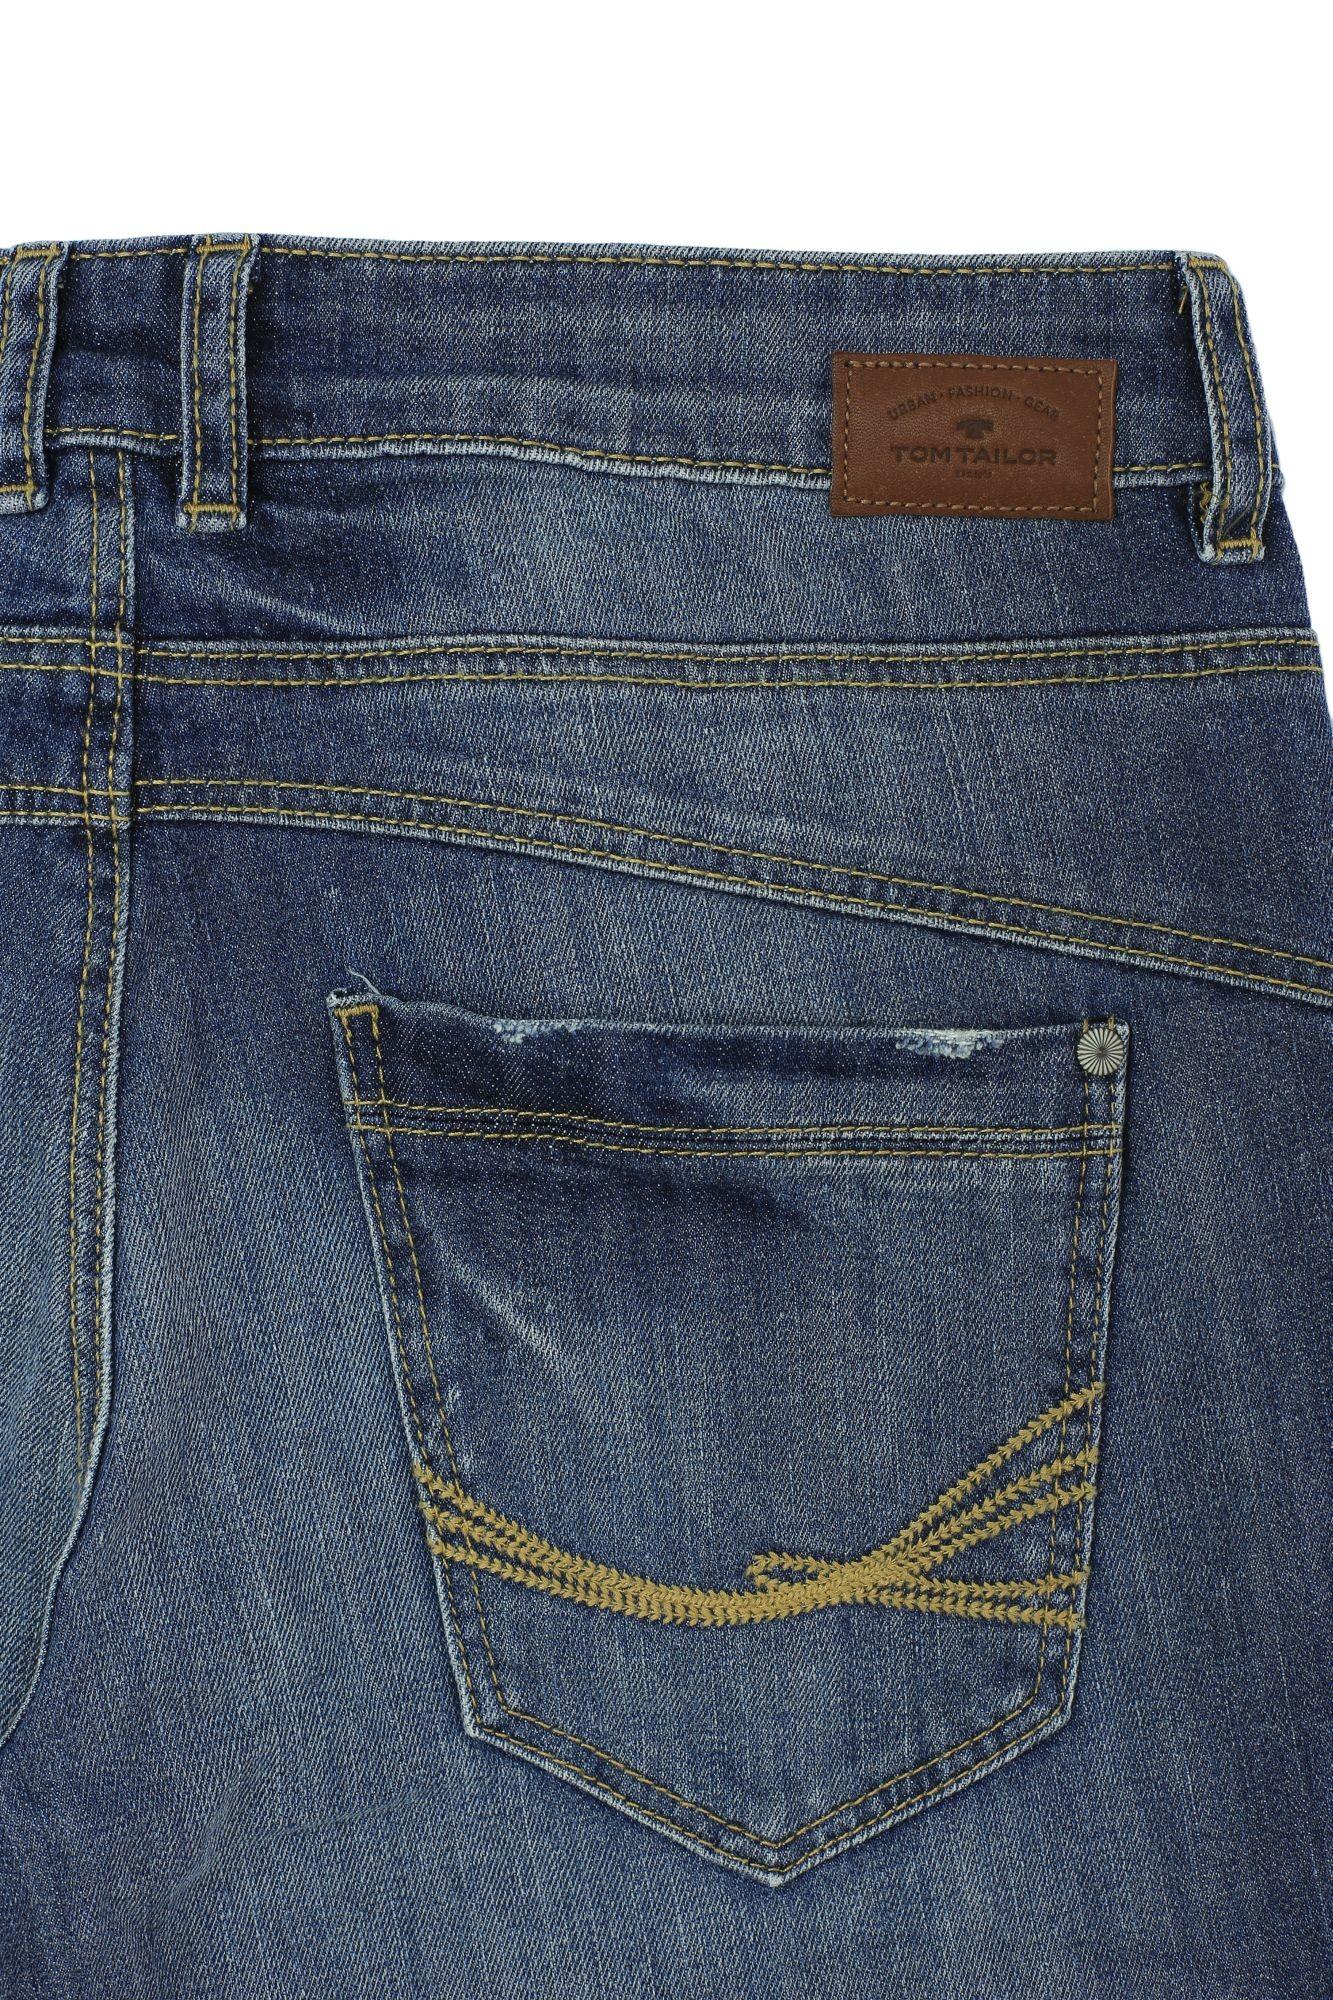 tom tailor jeans boyfriend damen stretch relaxed tarpered. Black Bedroom Furniture Sets. Home Design Ideas